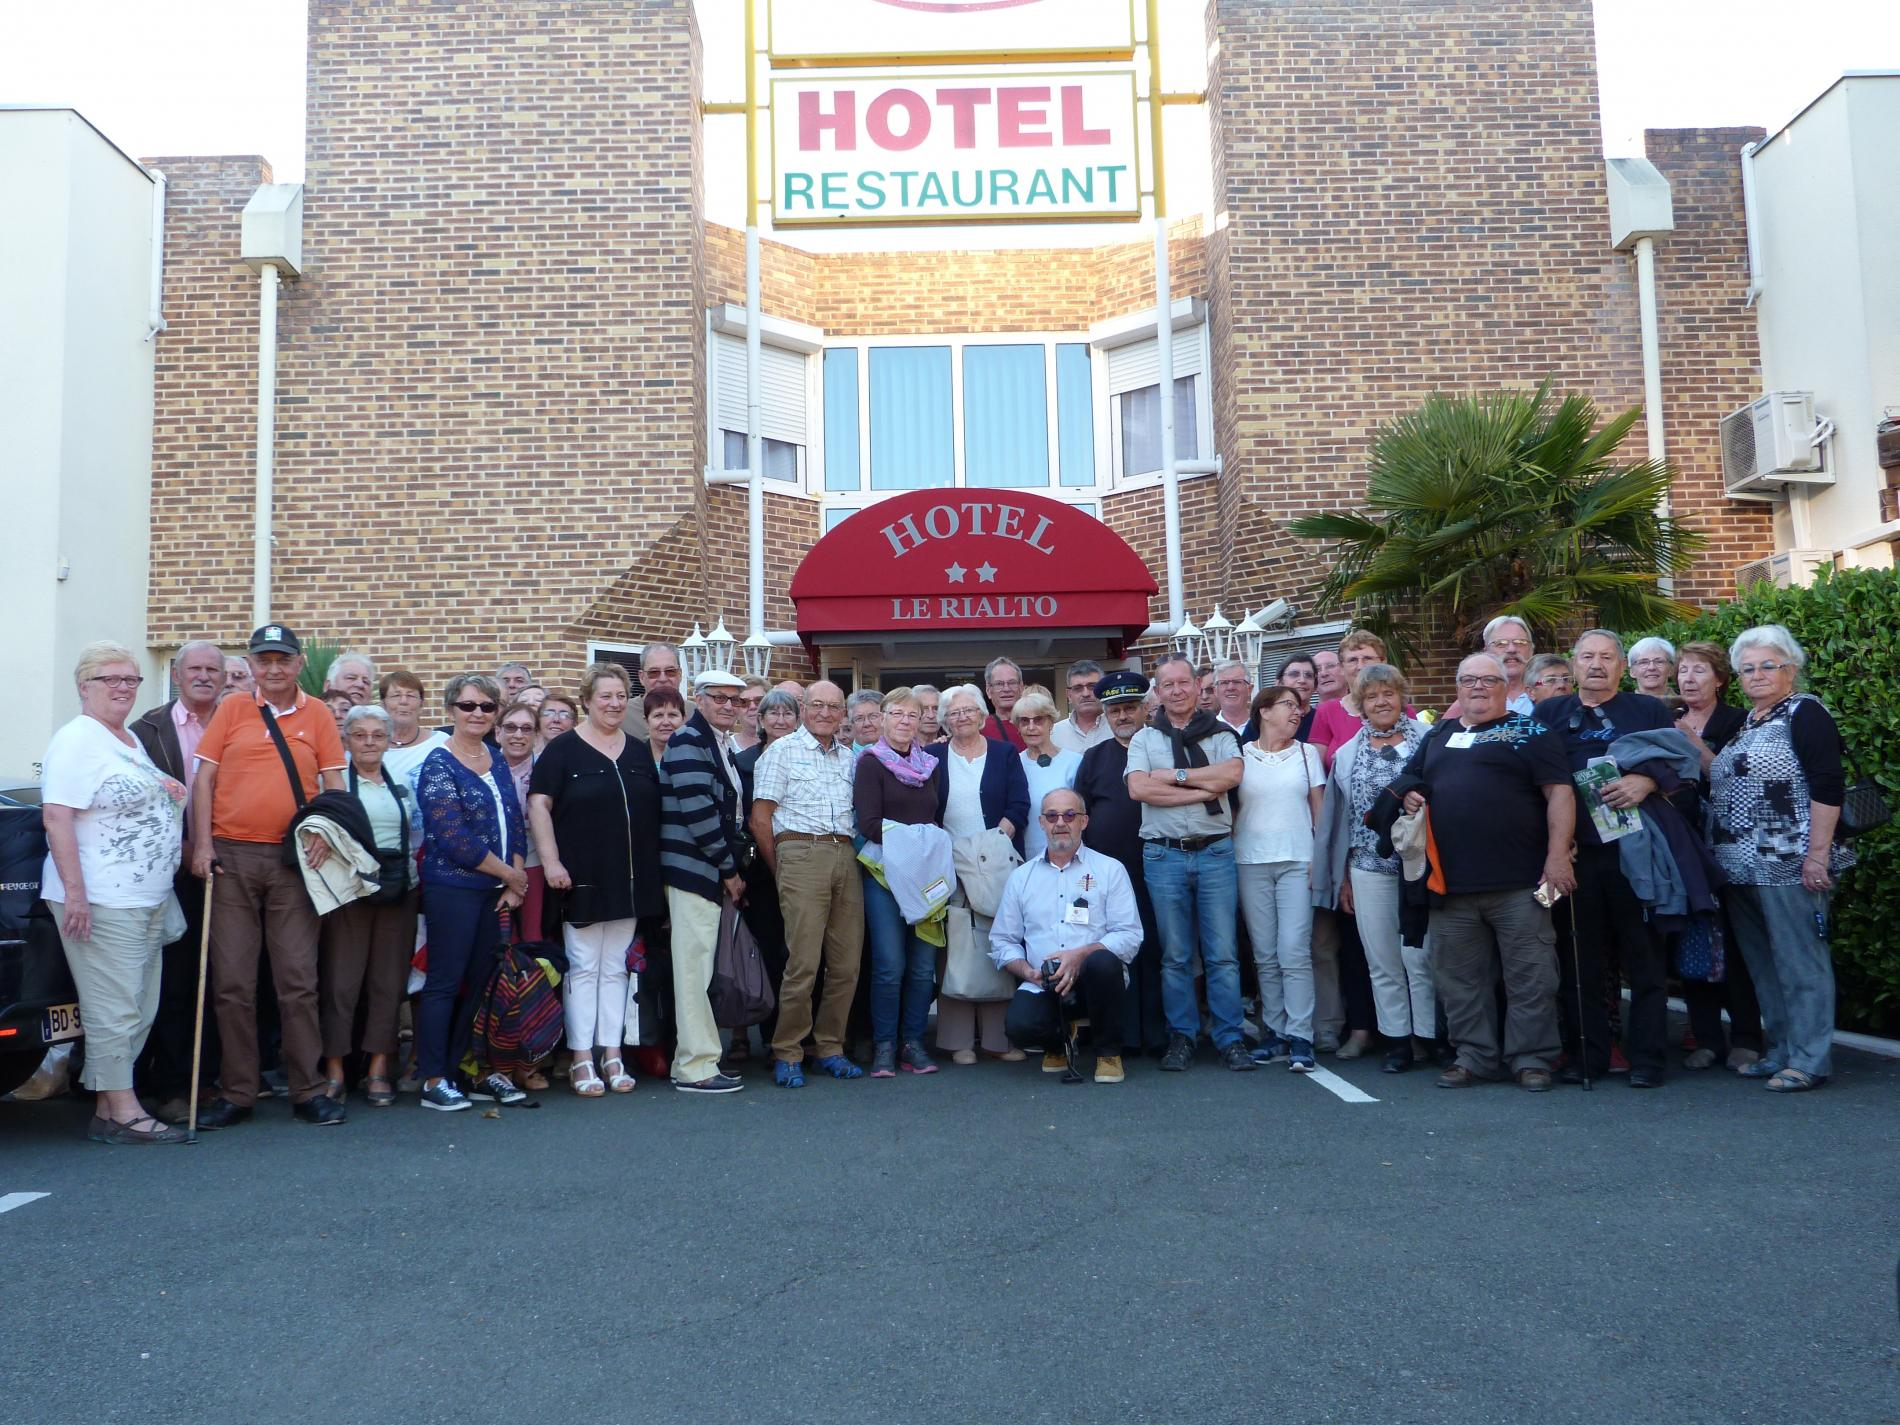 HOTEL RESTAURANT GROUPE 3eme AGE ALBI